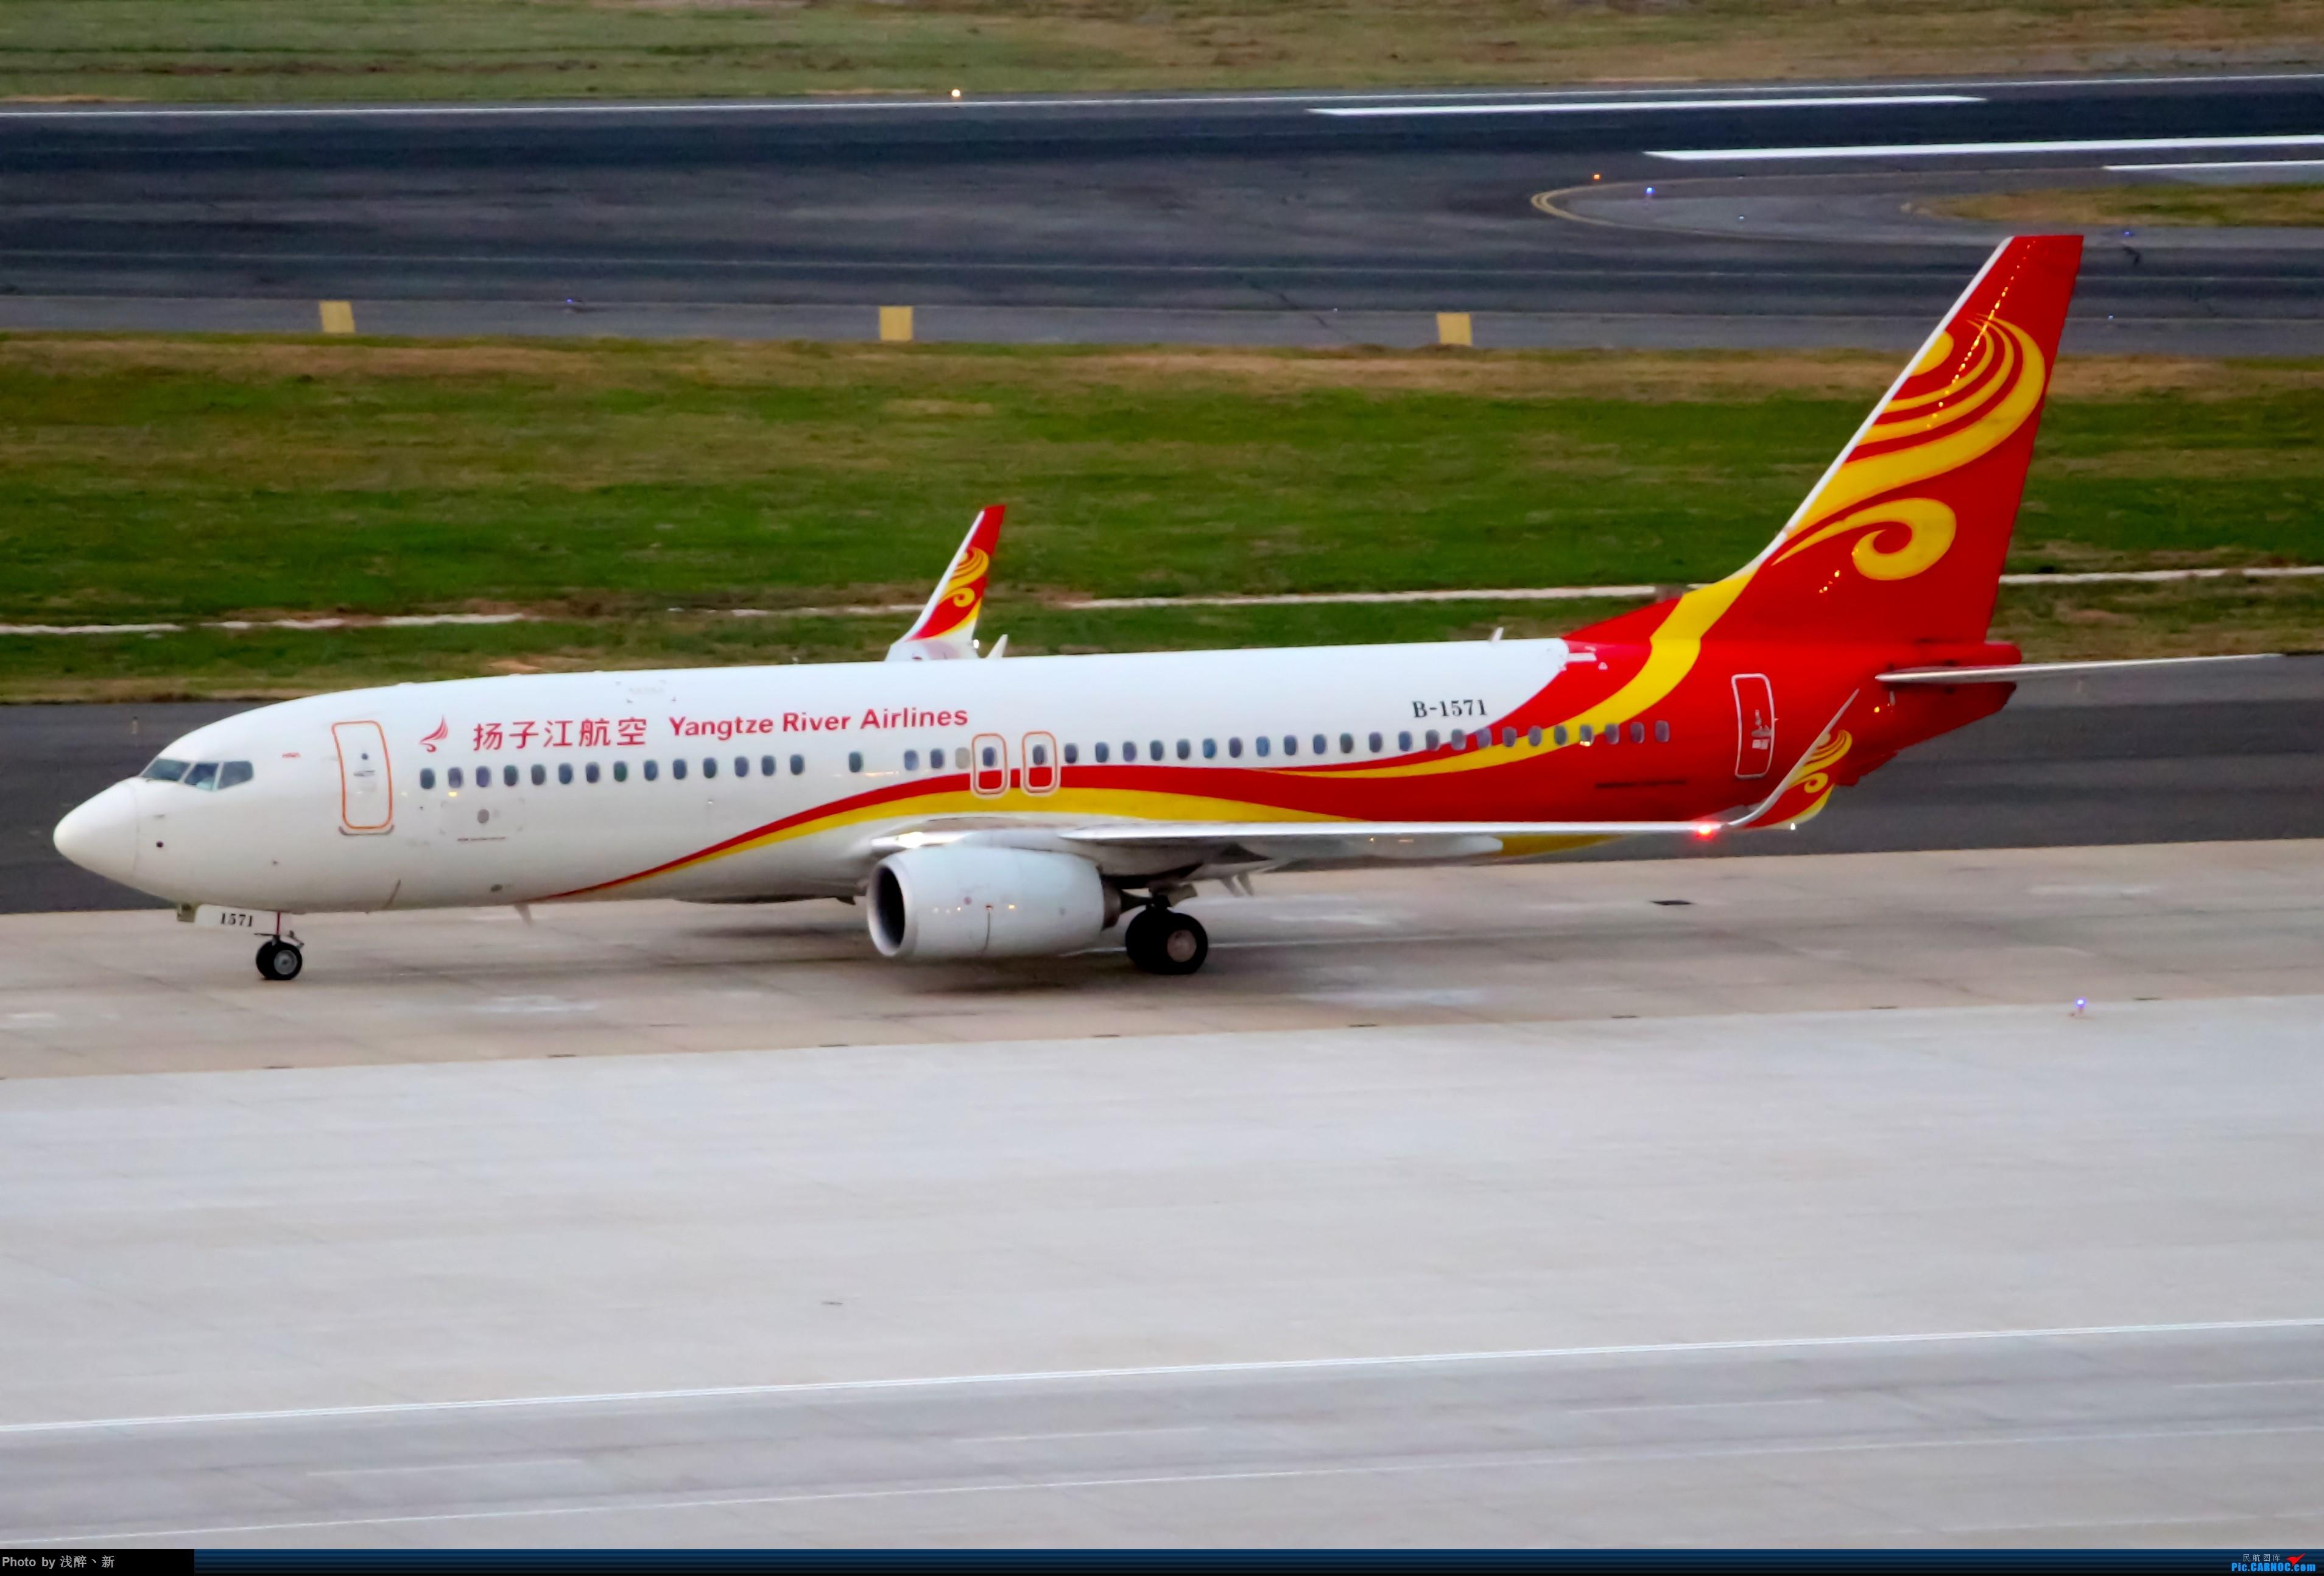 Re:[原创]DLC 9.15 日常杂货 BOEING 737-800 B-1571 中国大连国际机场